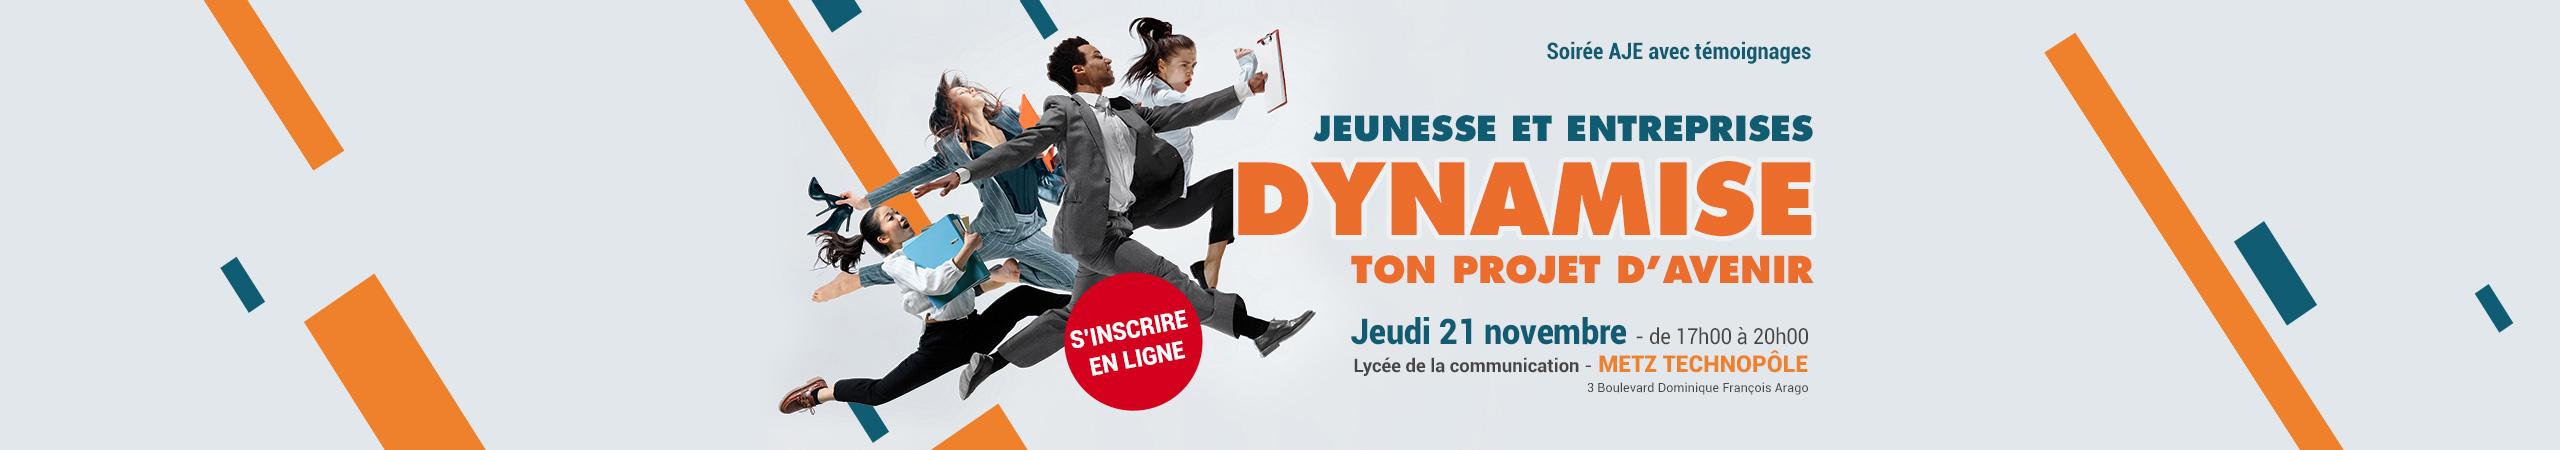 Slide-AJE-Dynamise-ton-projet-btn-inscription